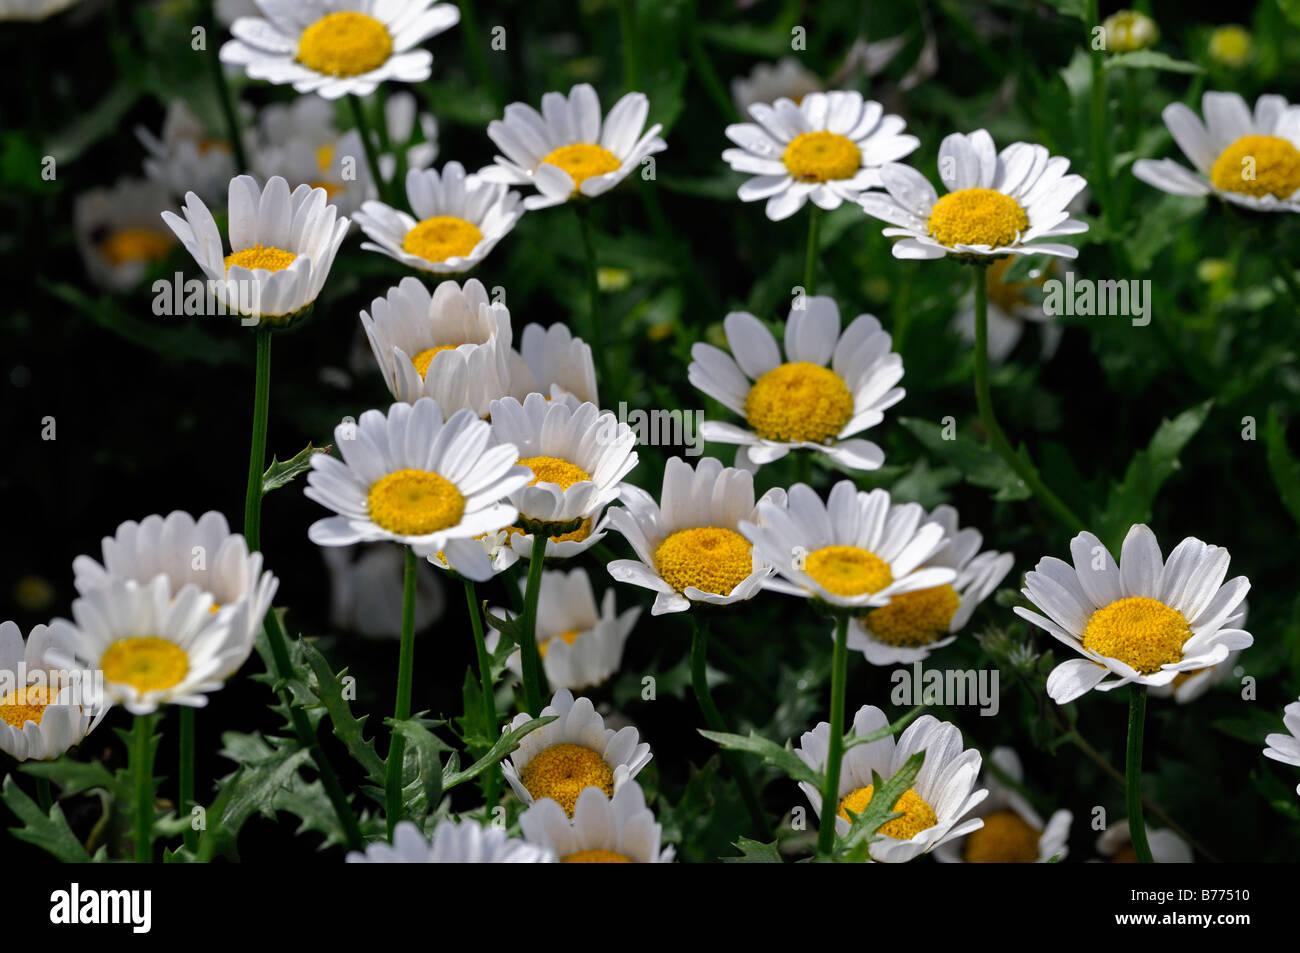 Yellow daisy type flower stock photos yellow daisy type flower chrysanthemum paludosum snowland leucanthemum mini marguerite dwarf daisy type annual flower bloom blossom dhlflorist Images